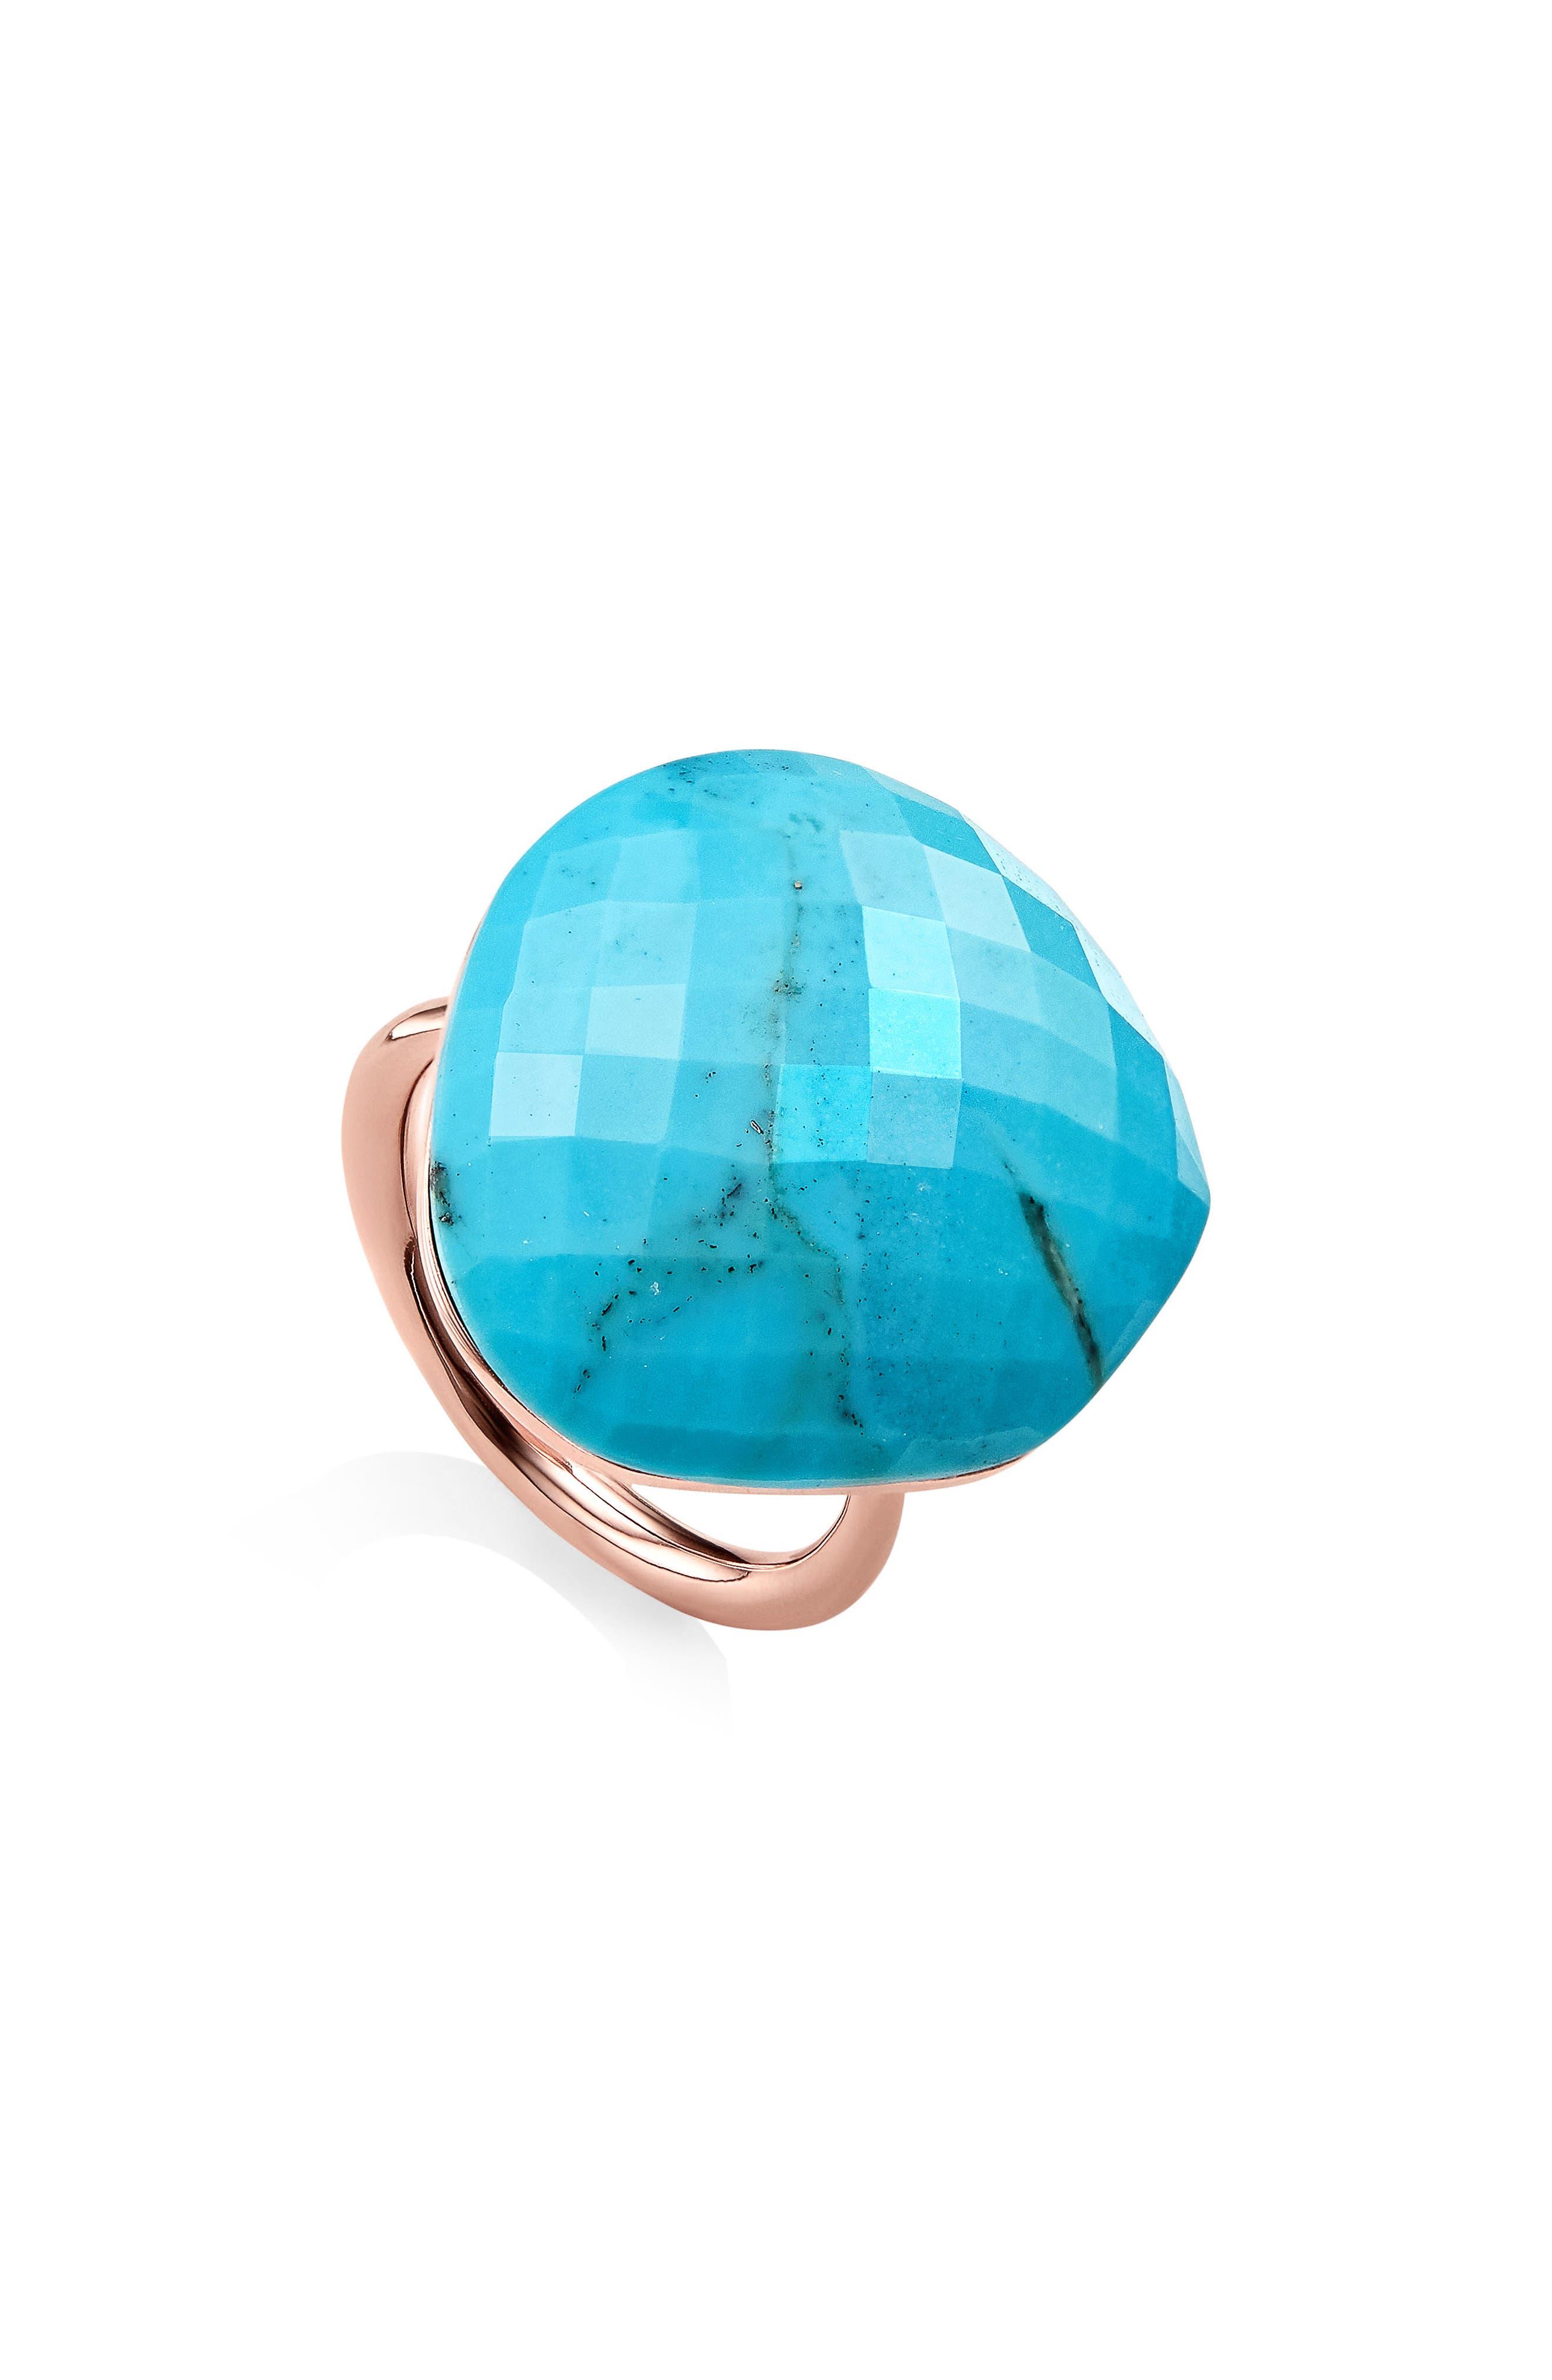 Main Image - Monica Vinader Nura Large Pebble Ring